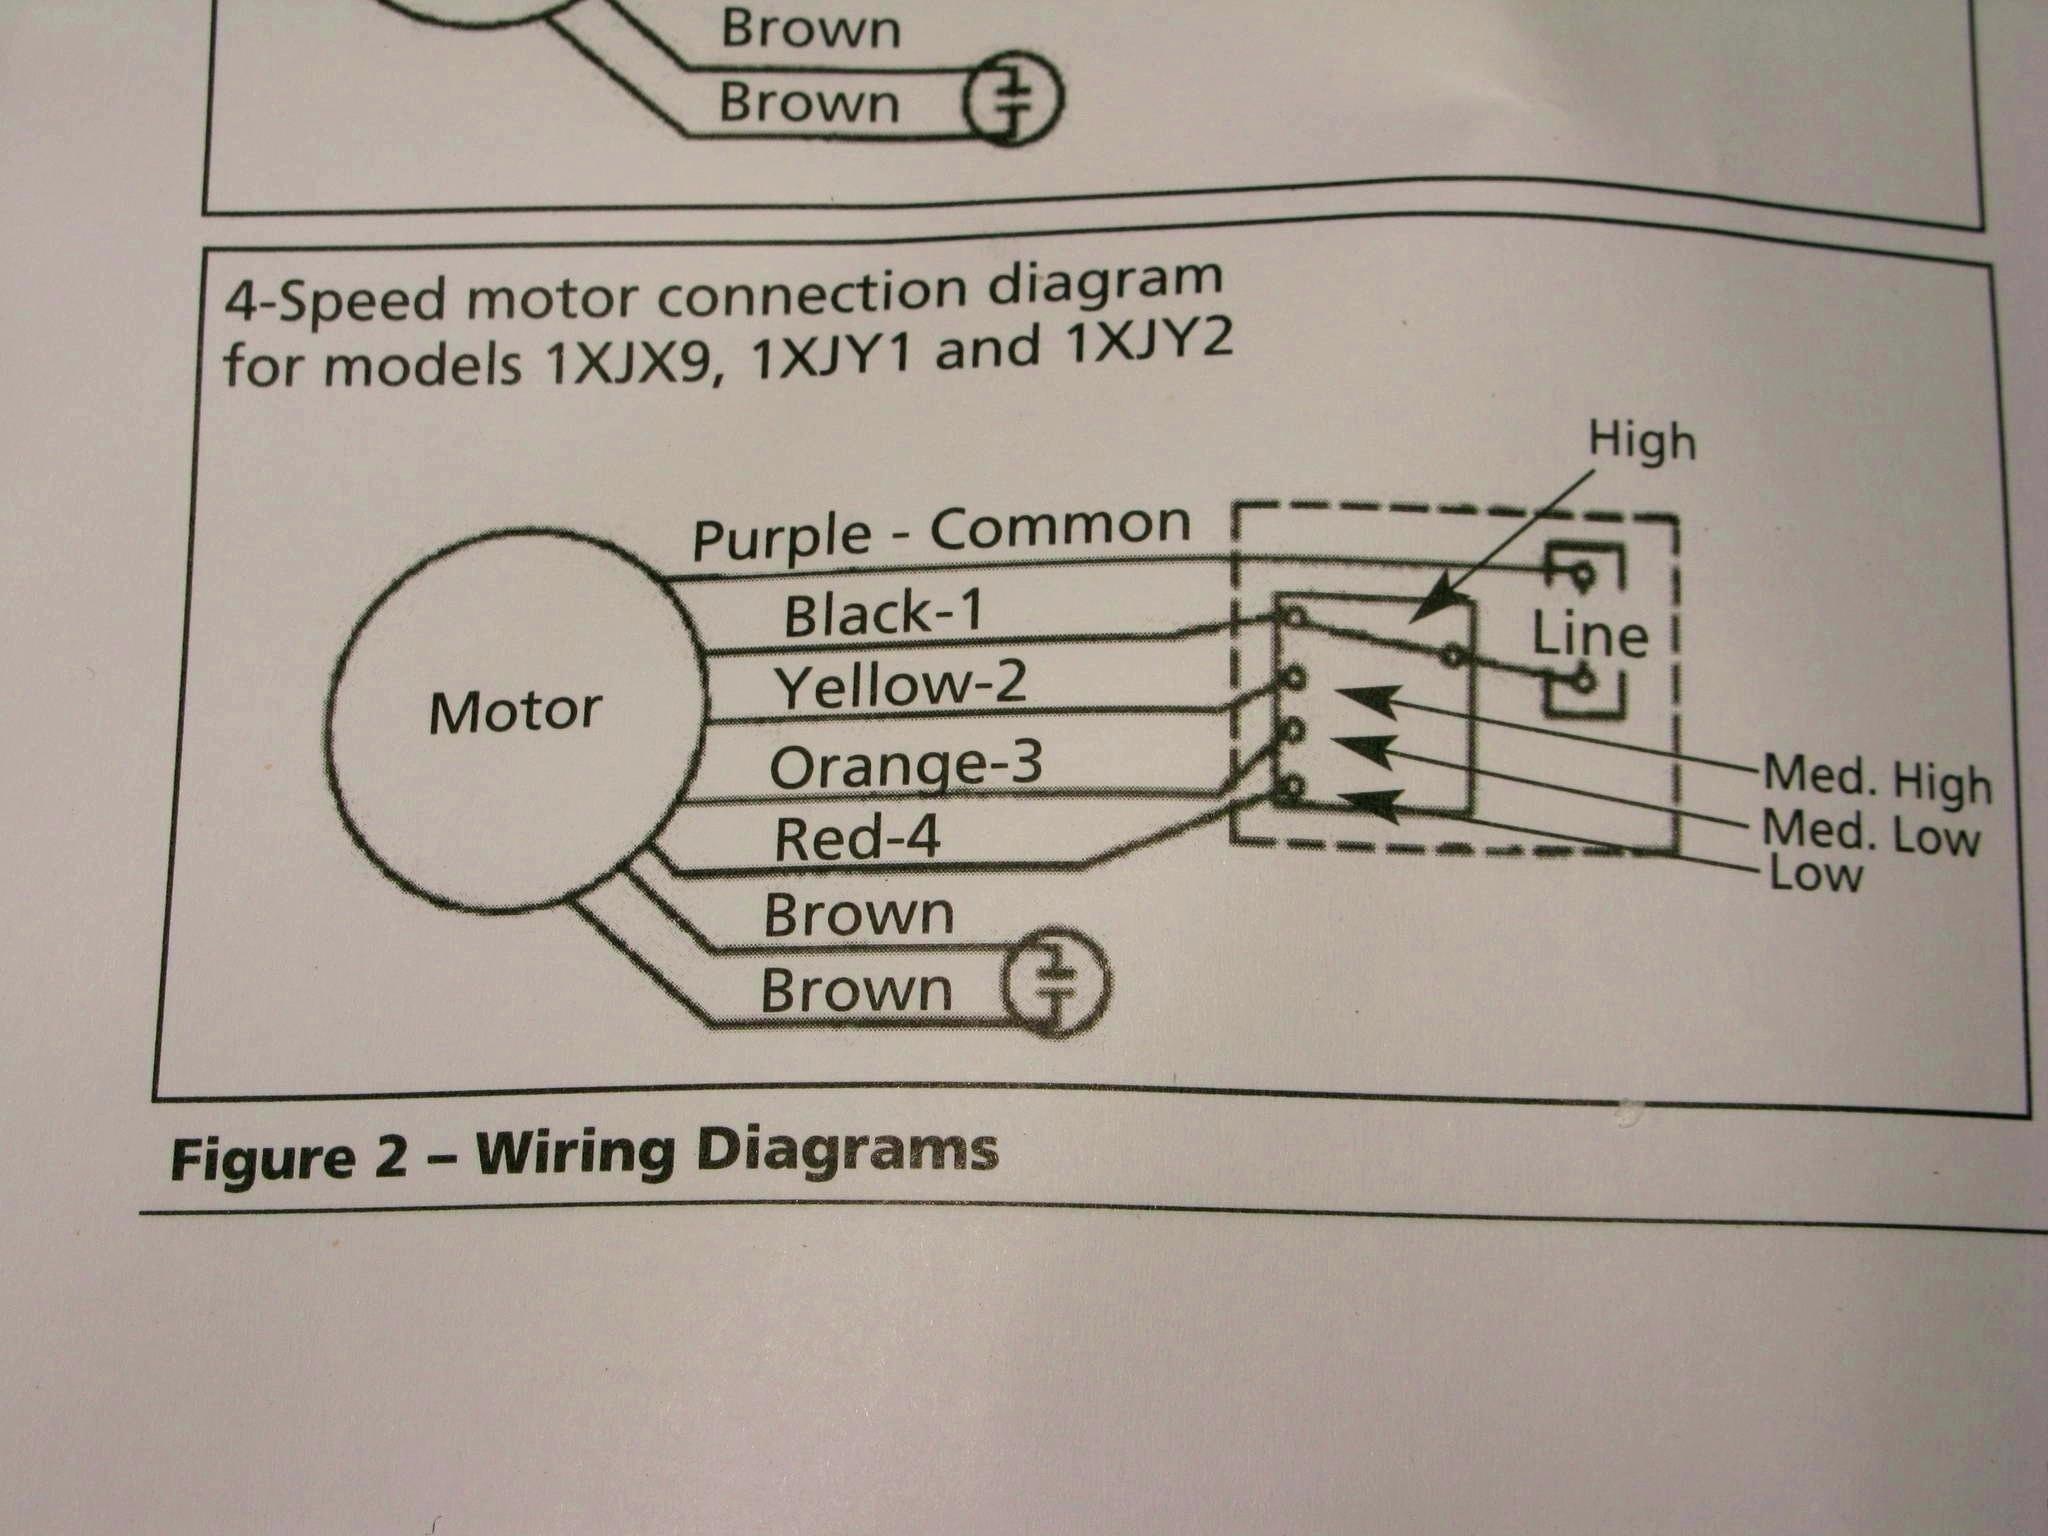 230 Volt Fan Motor Wiring Diagram | Wiring Library - Century Ac Motor Wiring Diagram 115 230 Volts